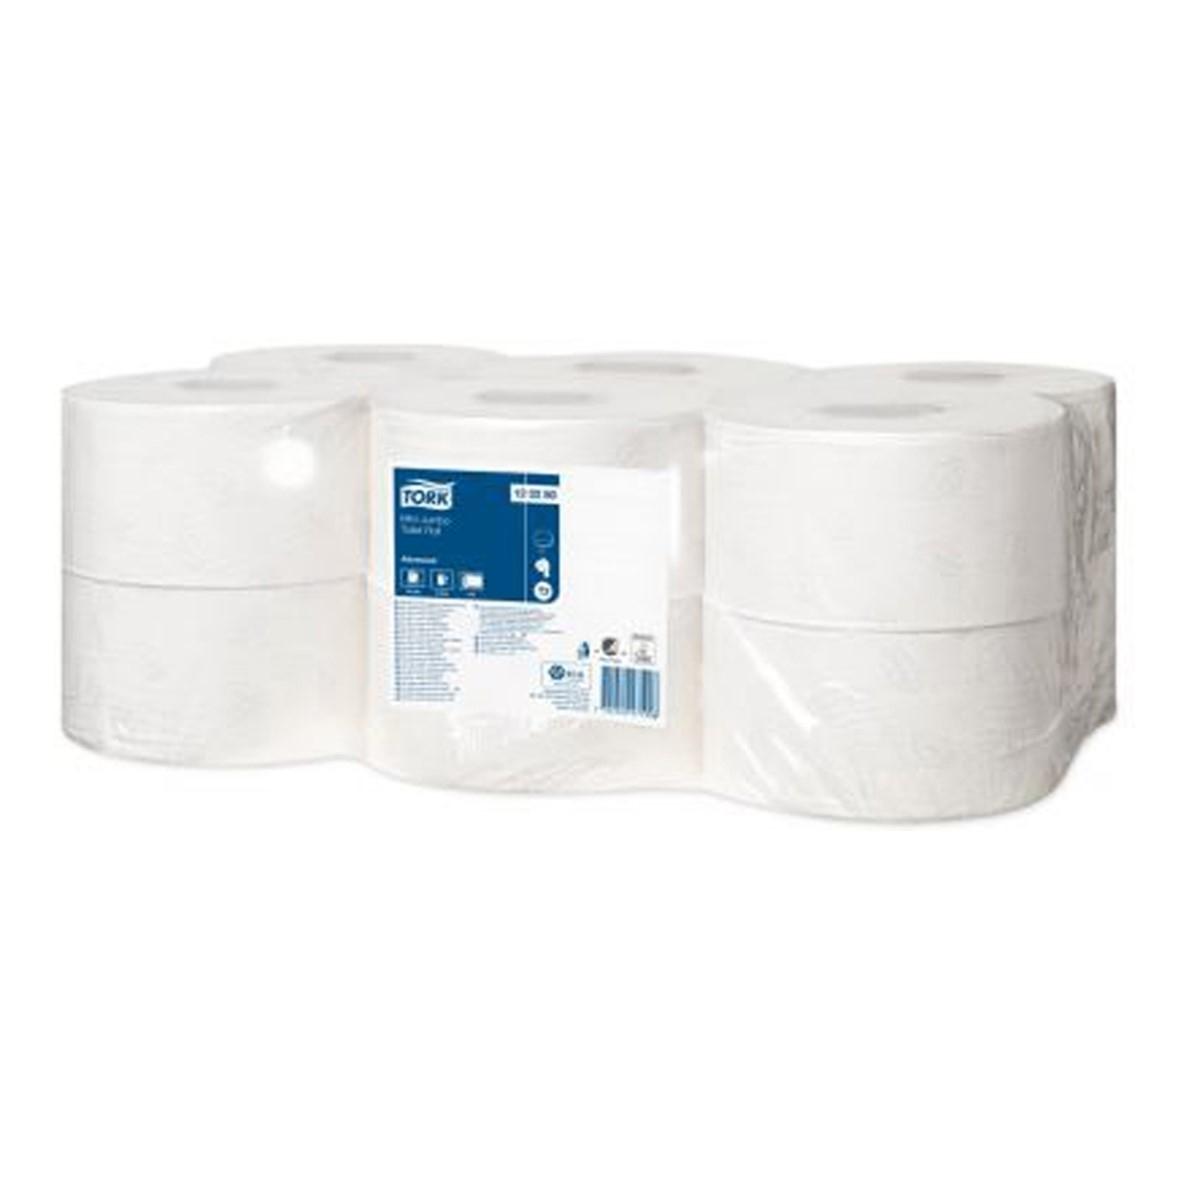 Tork Mini Jumbo Tuvalet Kağıdı Advanced 170m*12 resmi